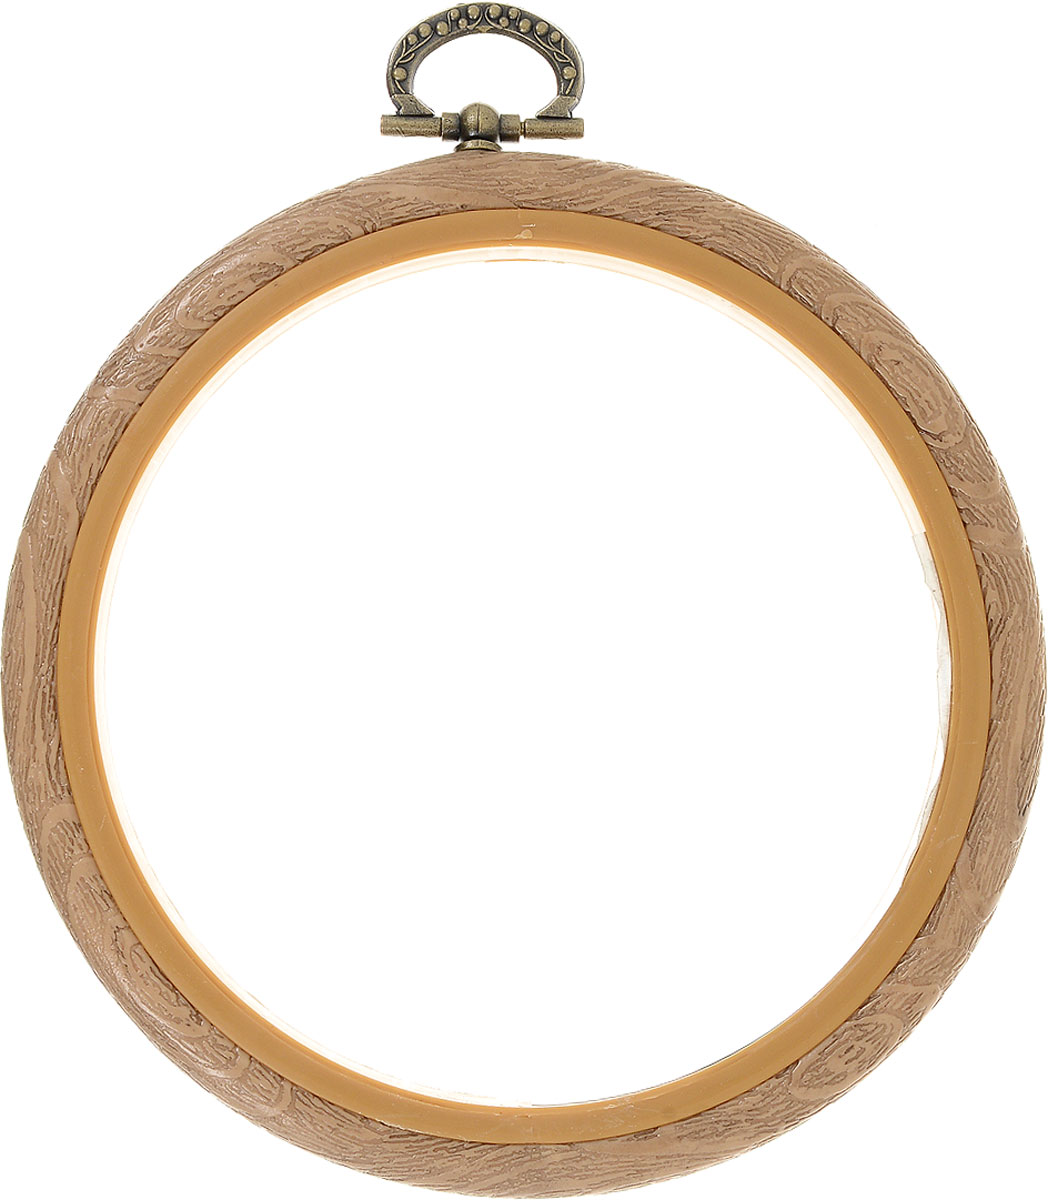 цена на Пяльцы-рамка Gamma, диаметр 10 см